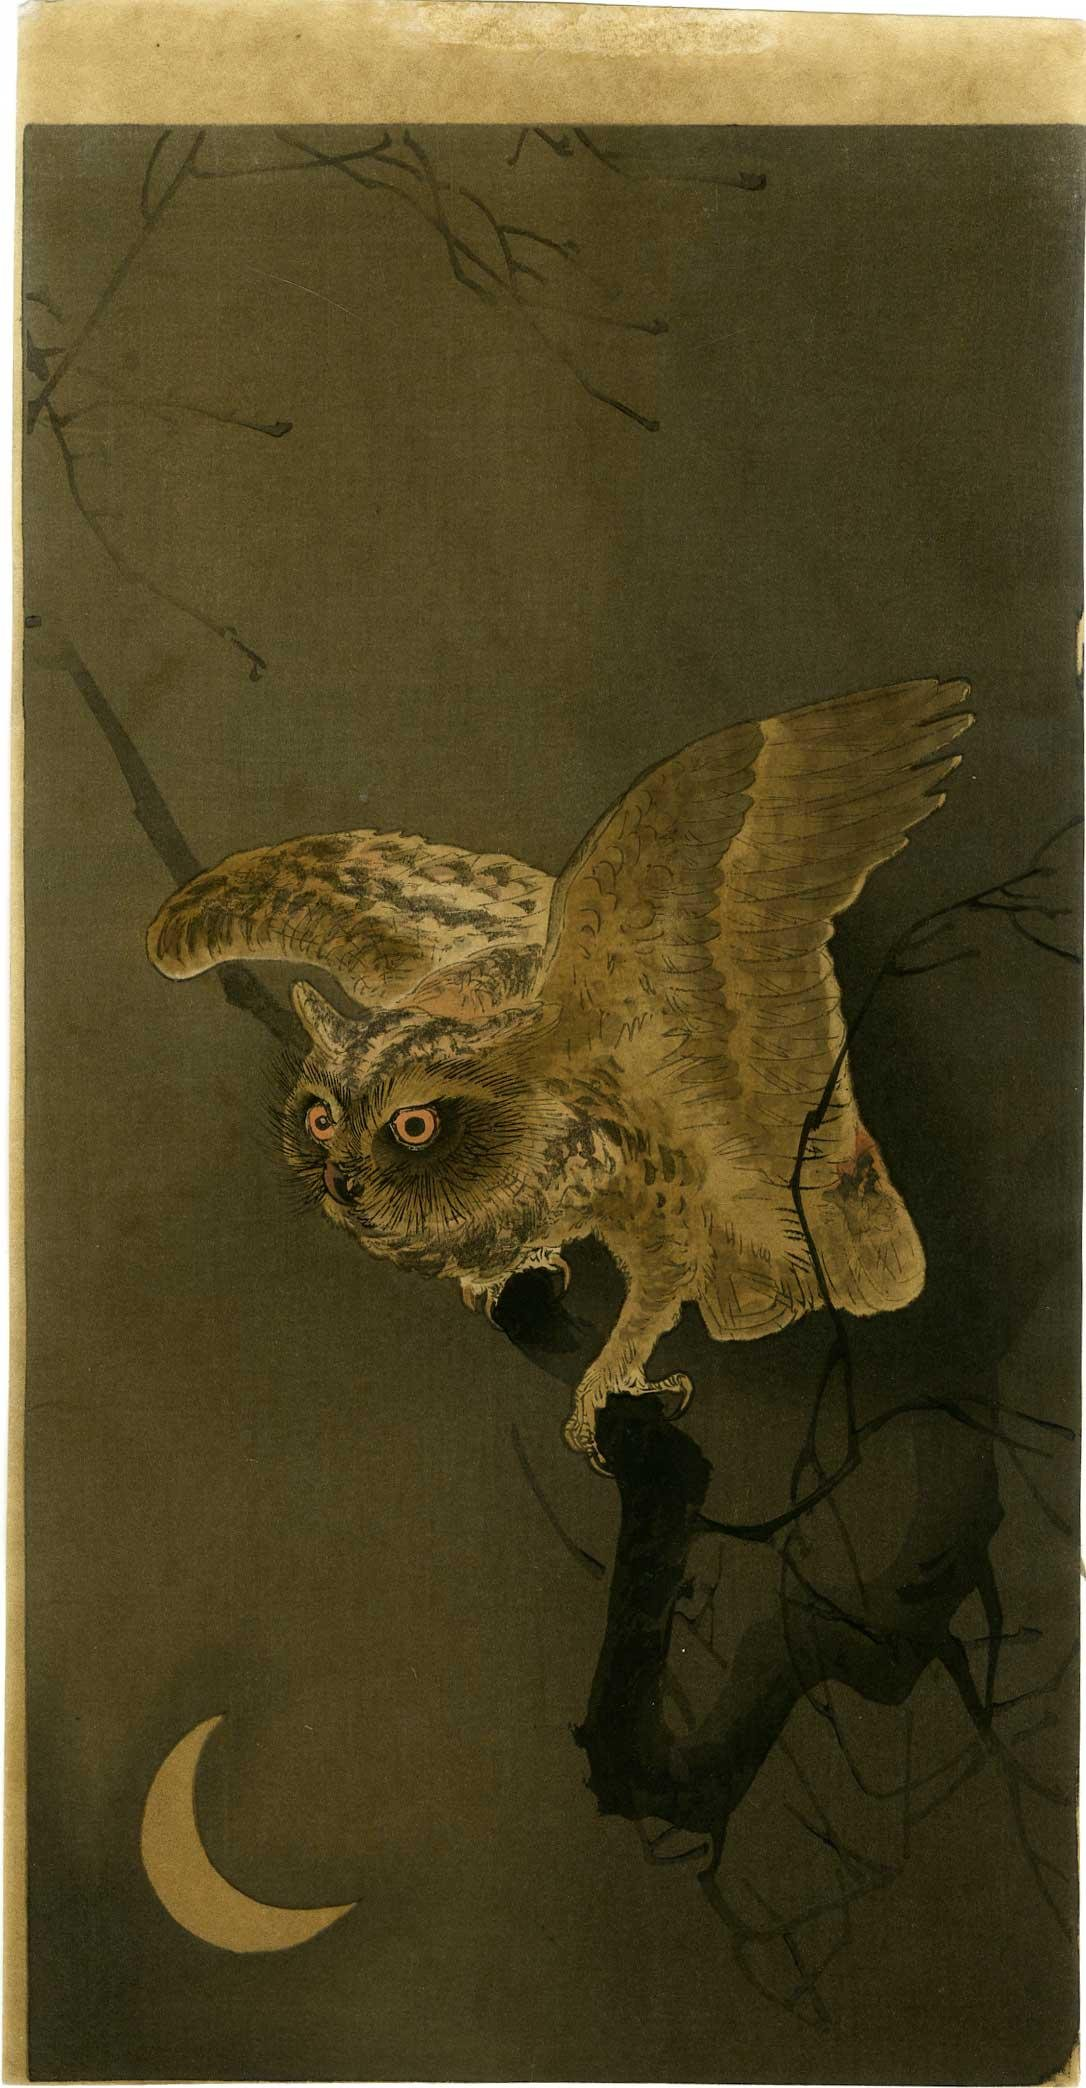 Ohara Koson - Owl and Crescent Moon c1910/23 woodblock